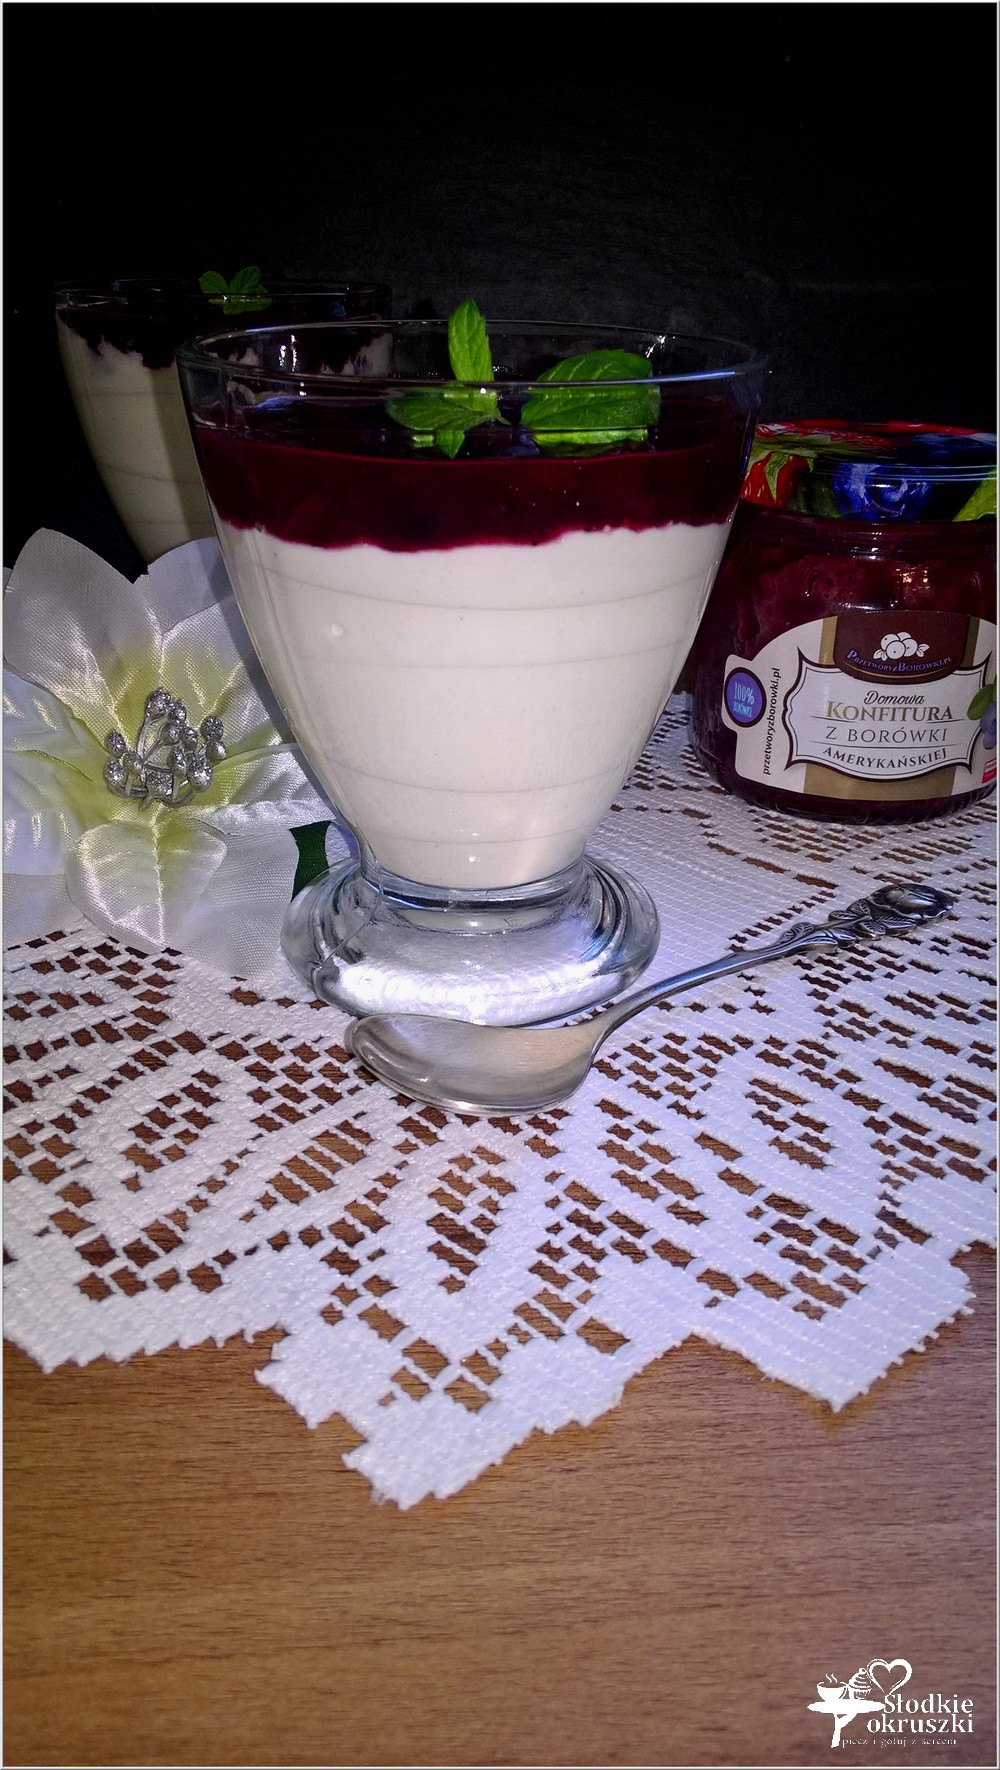 serniczki-na-zimno-z-konfitura-z-borowki